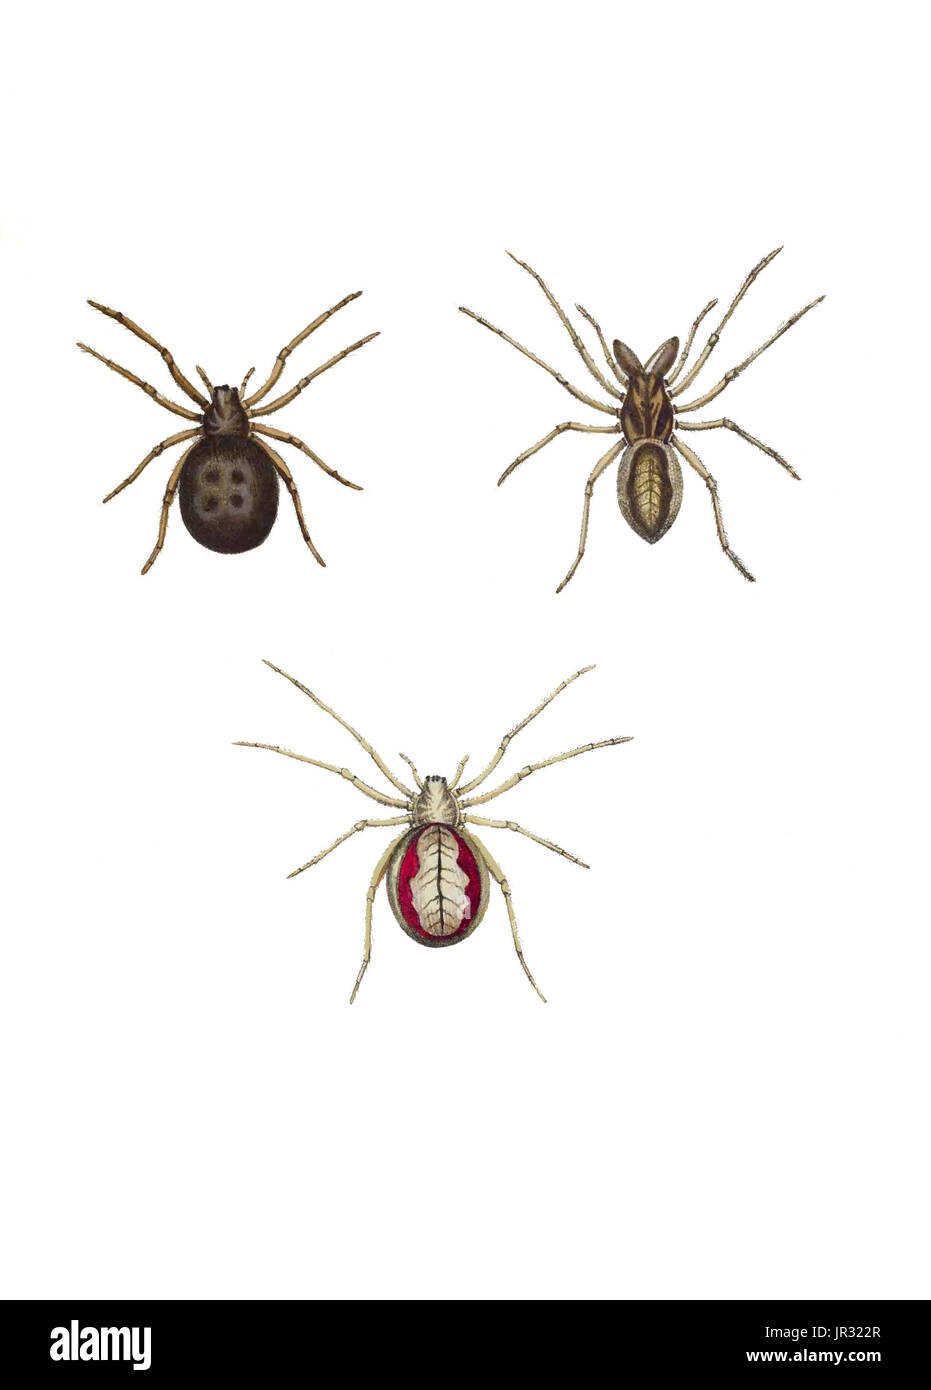 Monographia Aranearum,Spiders - Stock Image